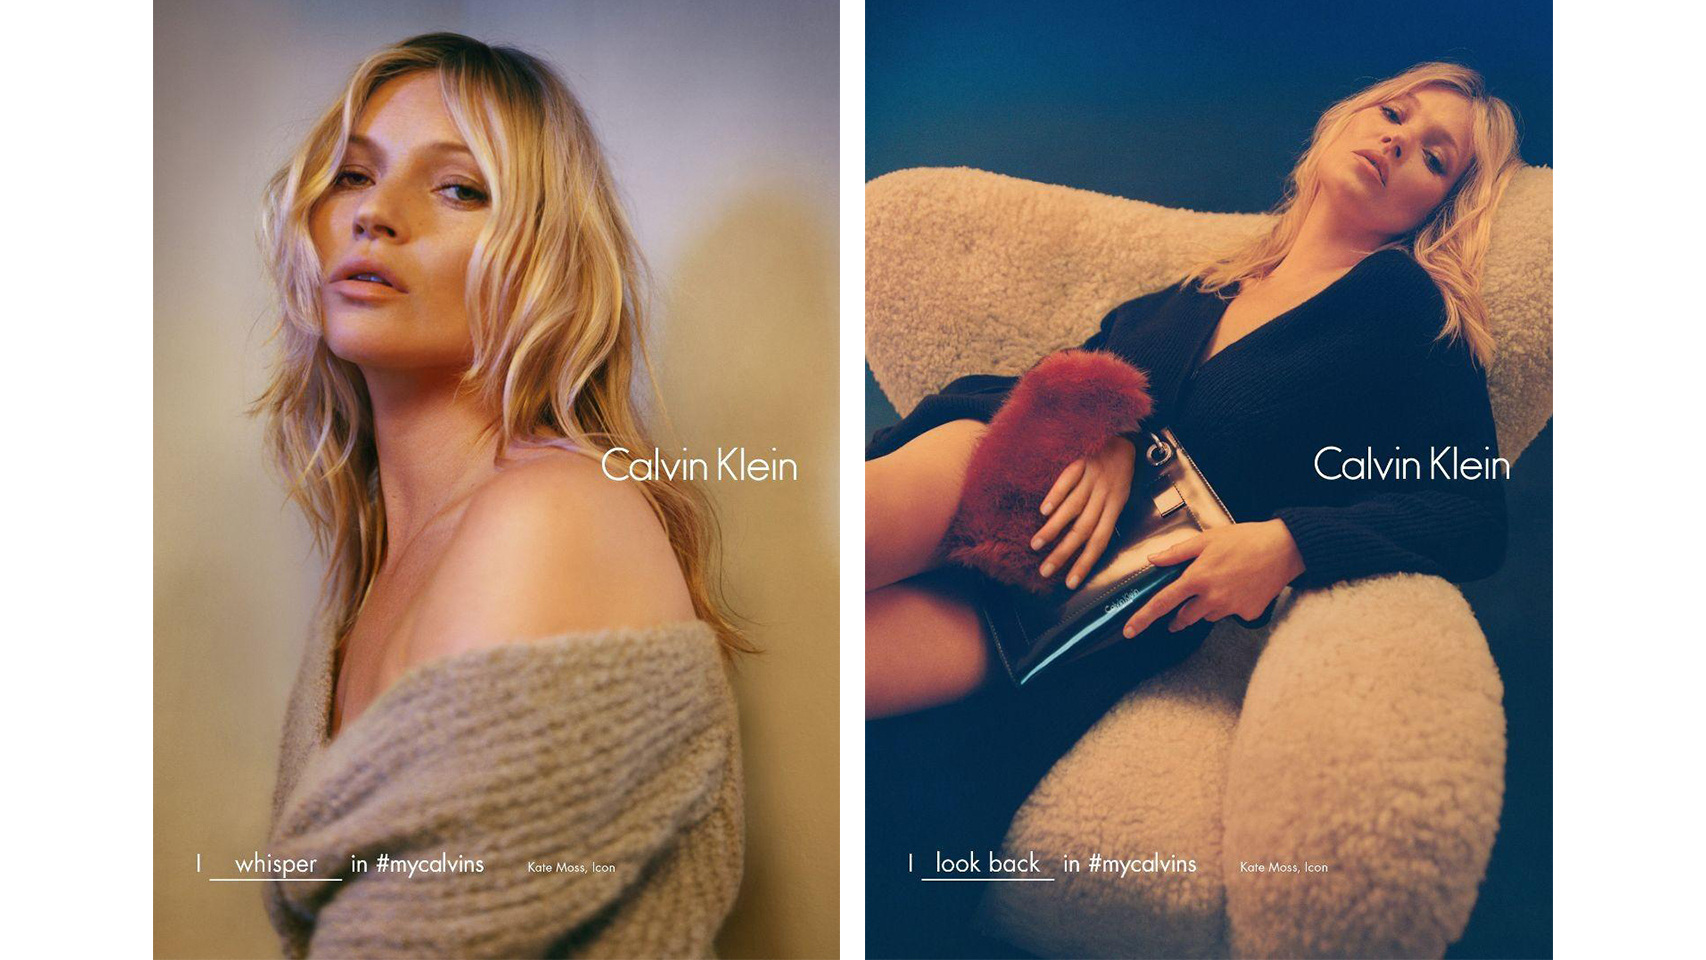 Kate Moss en la campaña #mycalvins